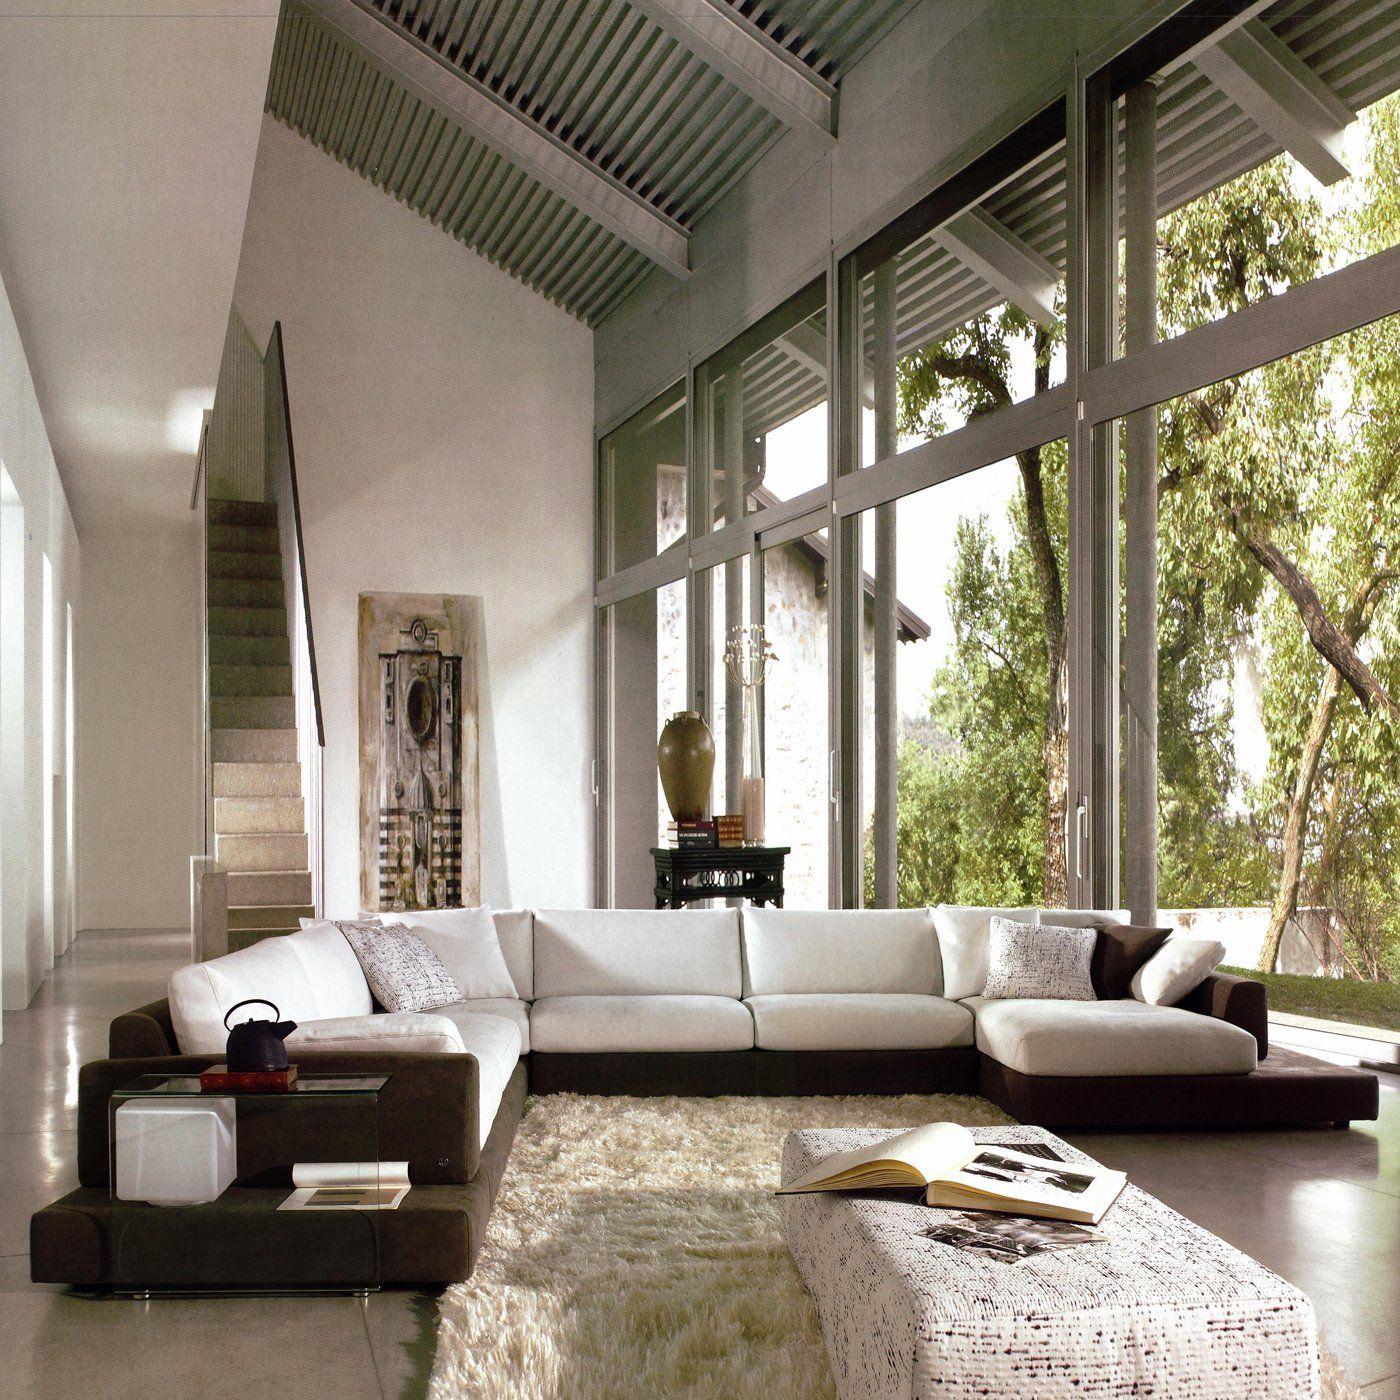 Marthena Home Furnishings Baxton Sectional home